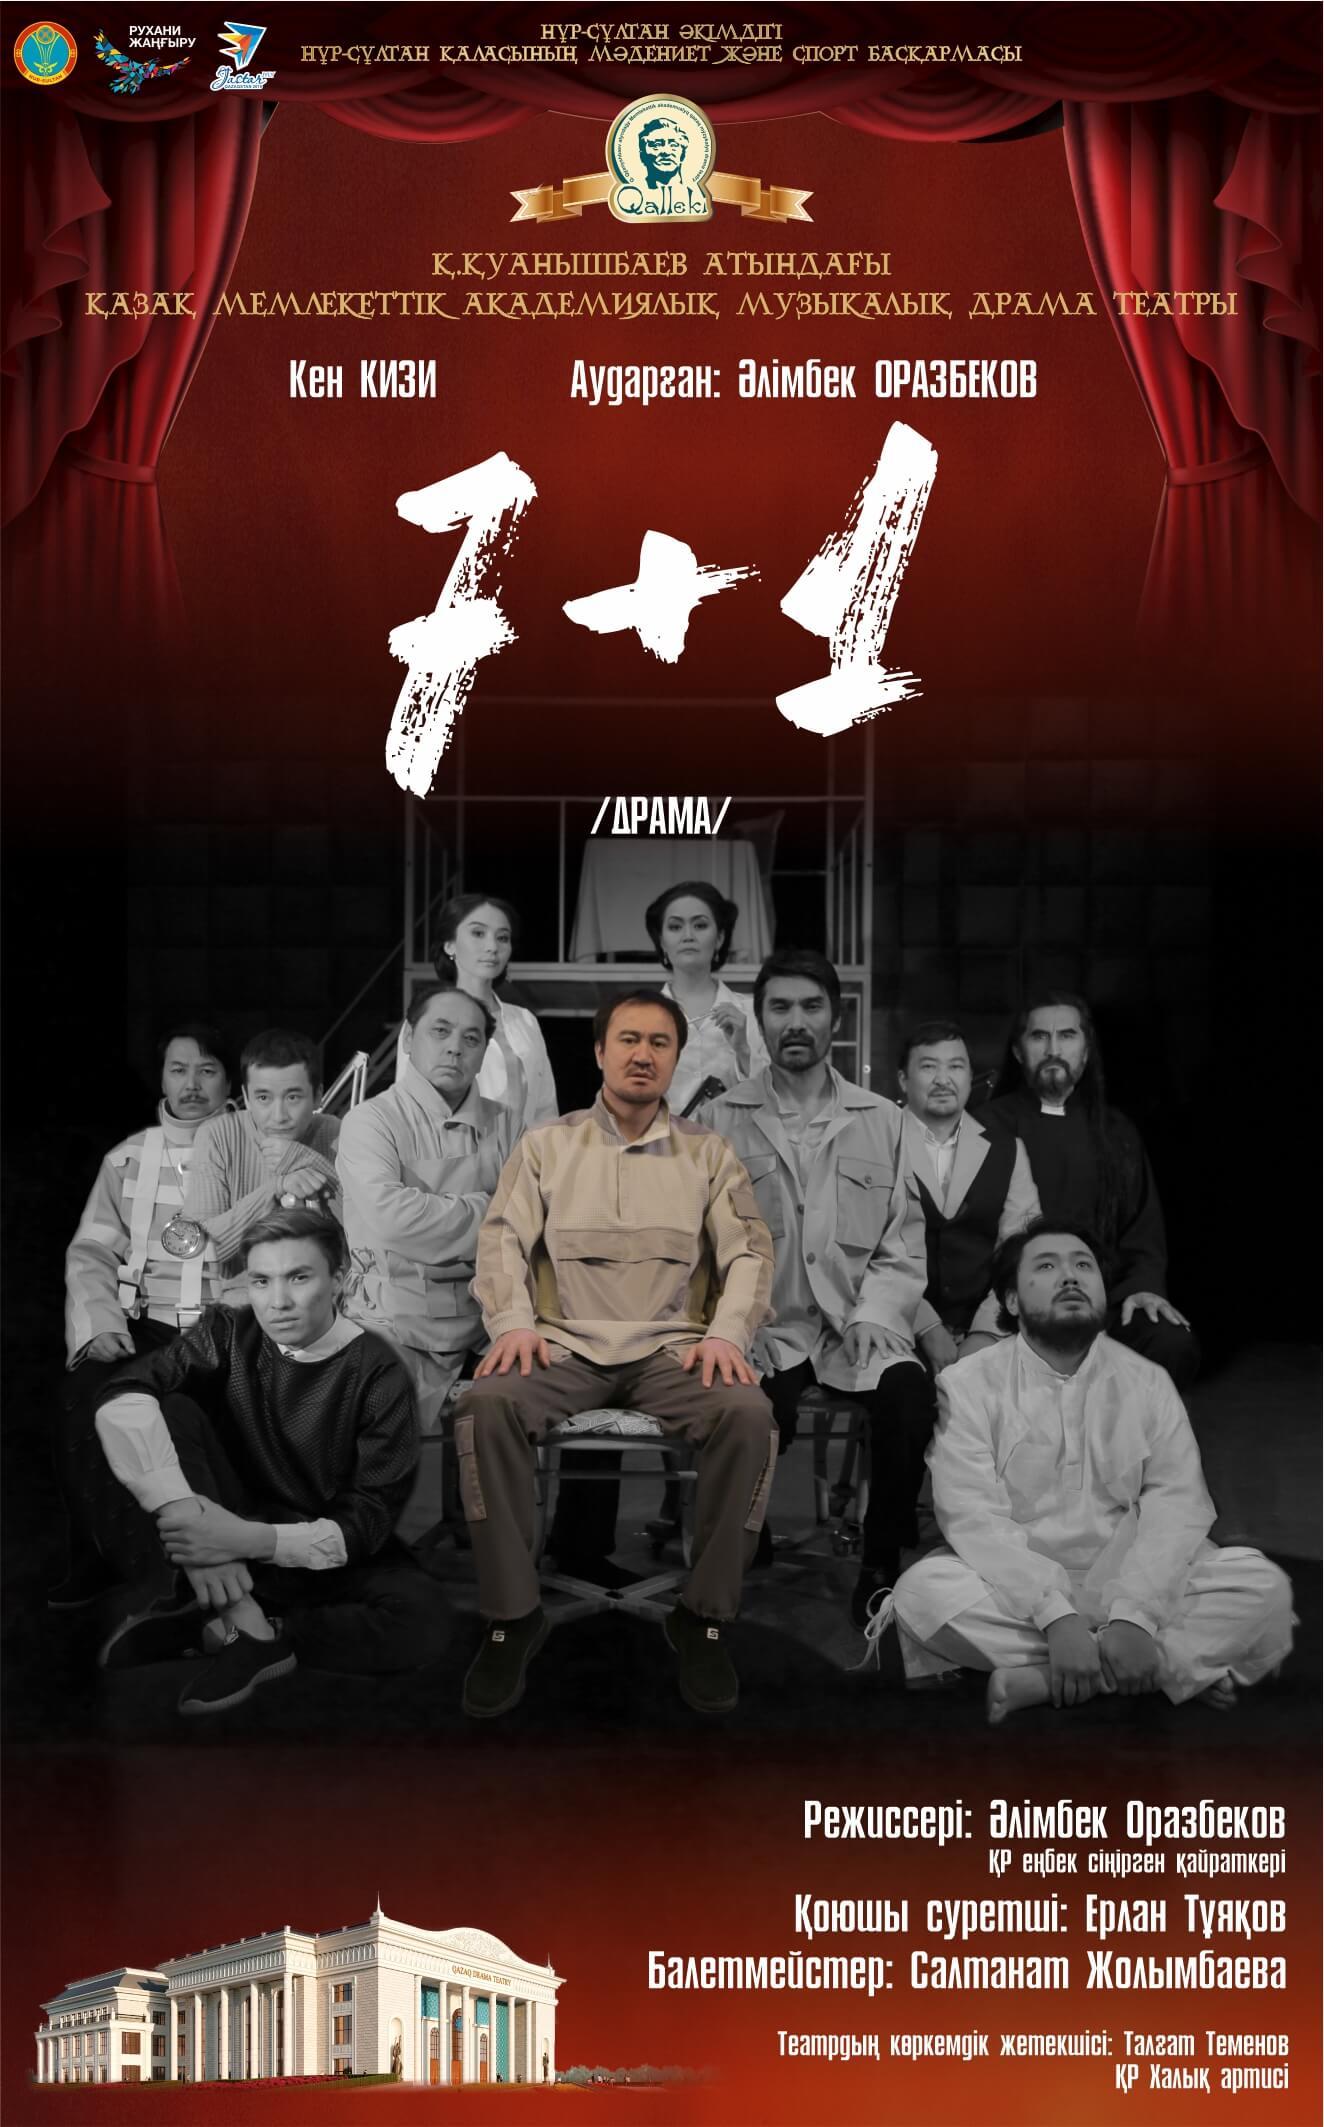 7-1 / Театр им. К. Куанышбаева